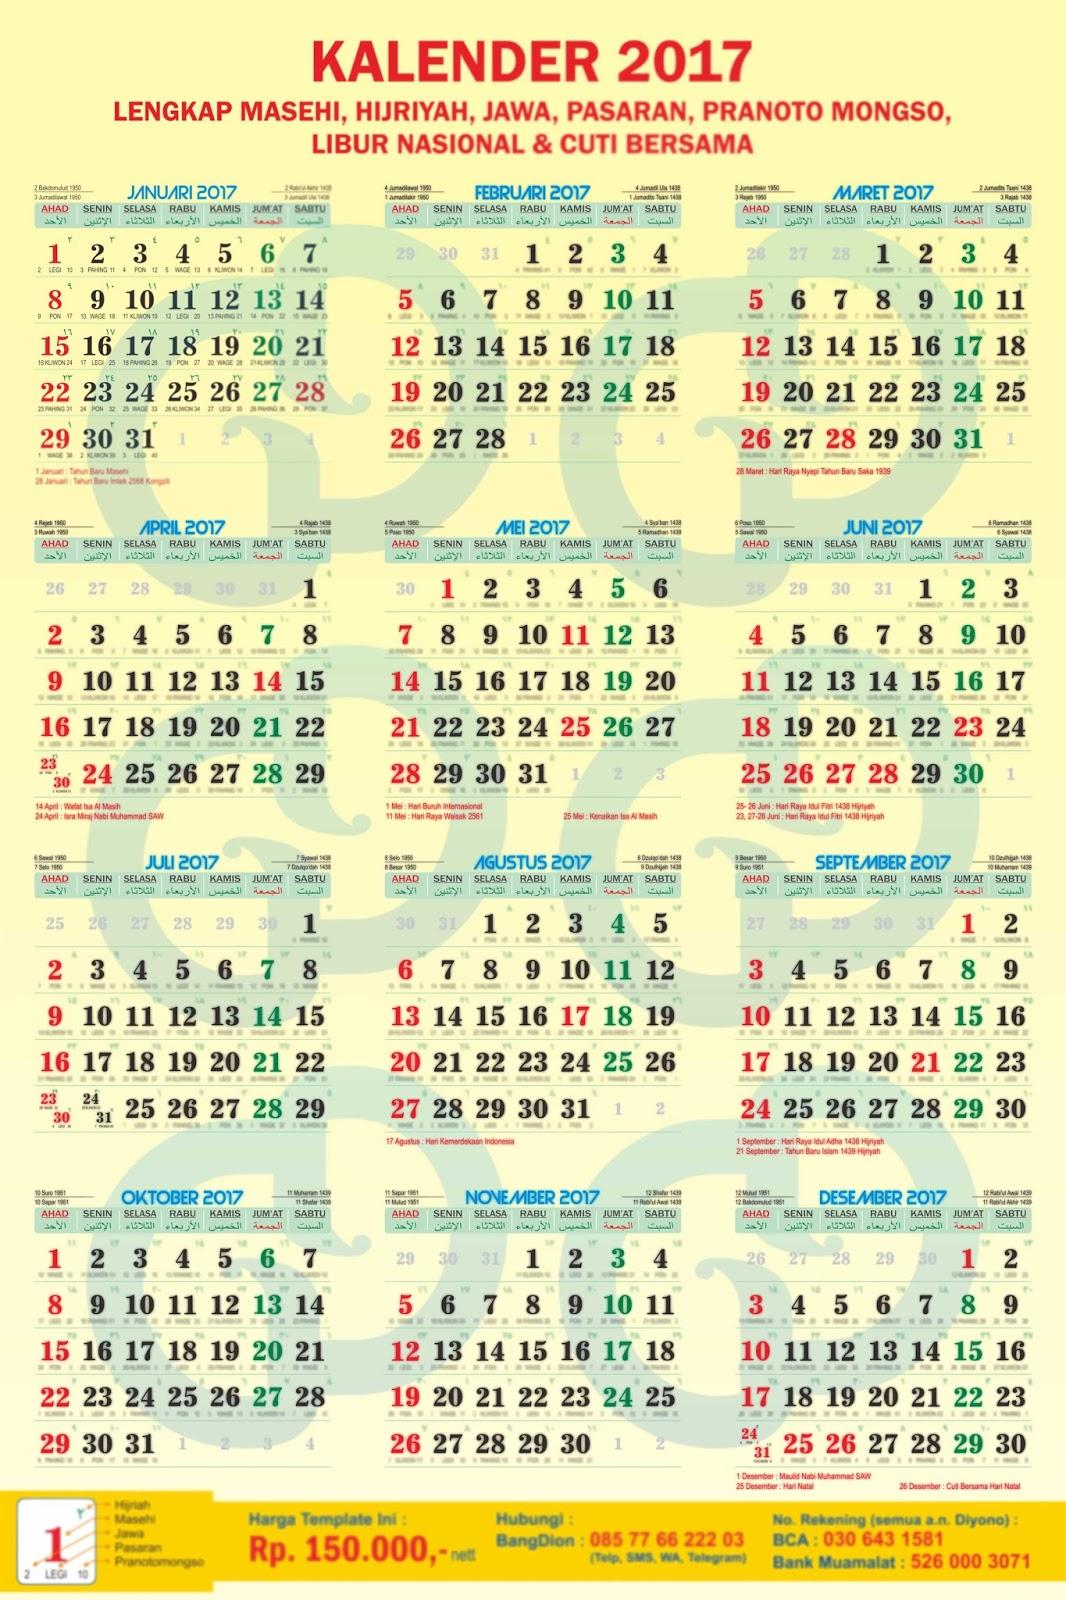 Kalender 2017 Indonesia Cdr : kalender, indonesia, PUSAT, CETAK, KALENDER, 2017: